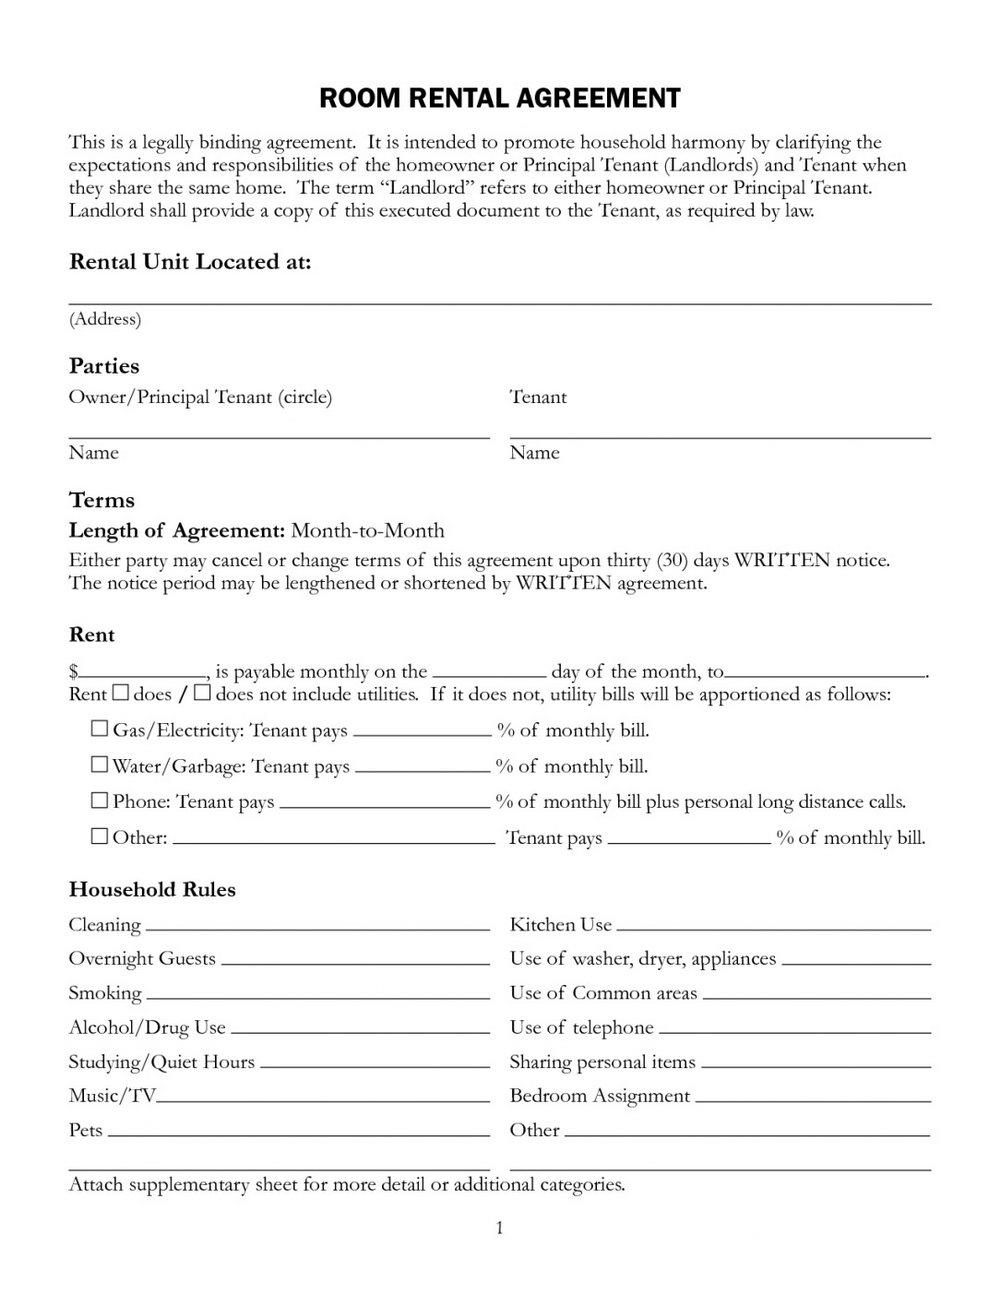 Arizona Rental Agreement Form